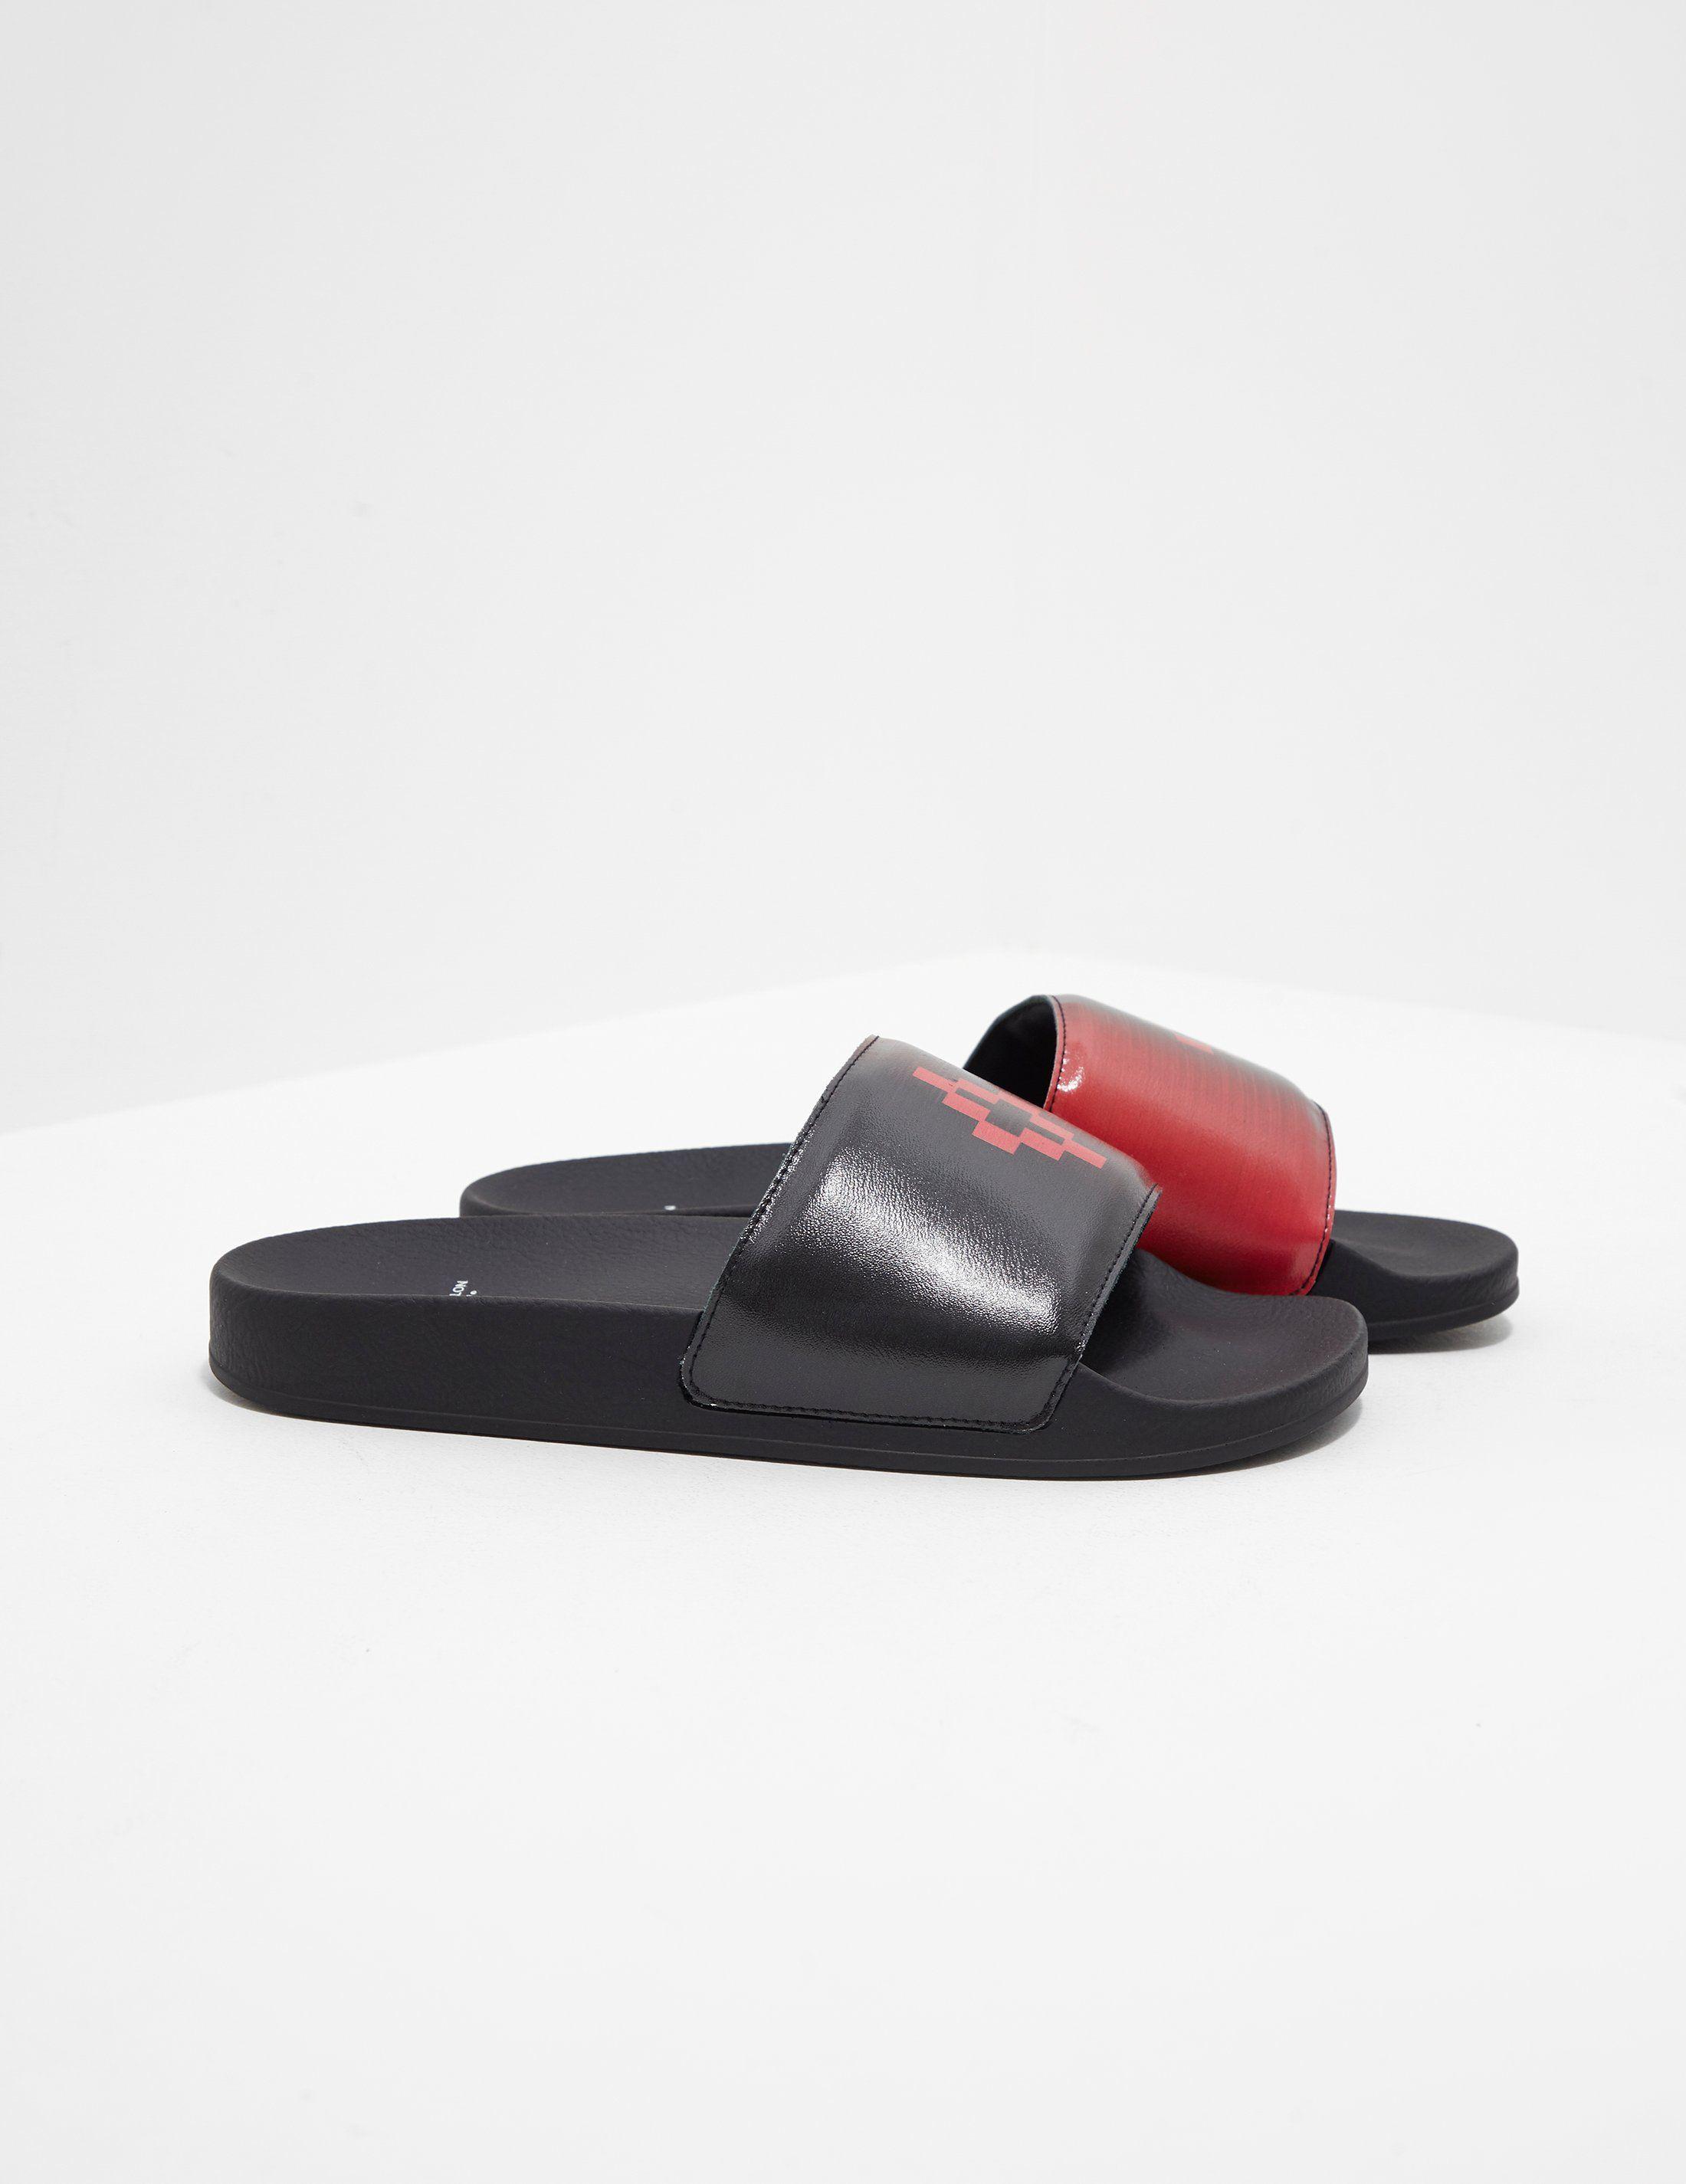 Marcelo Burlon Slides